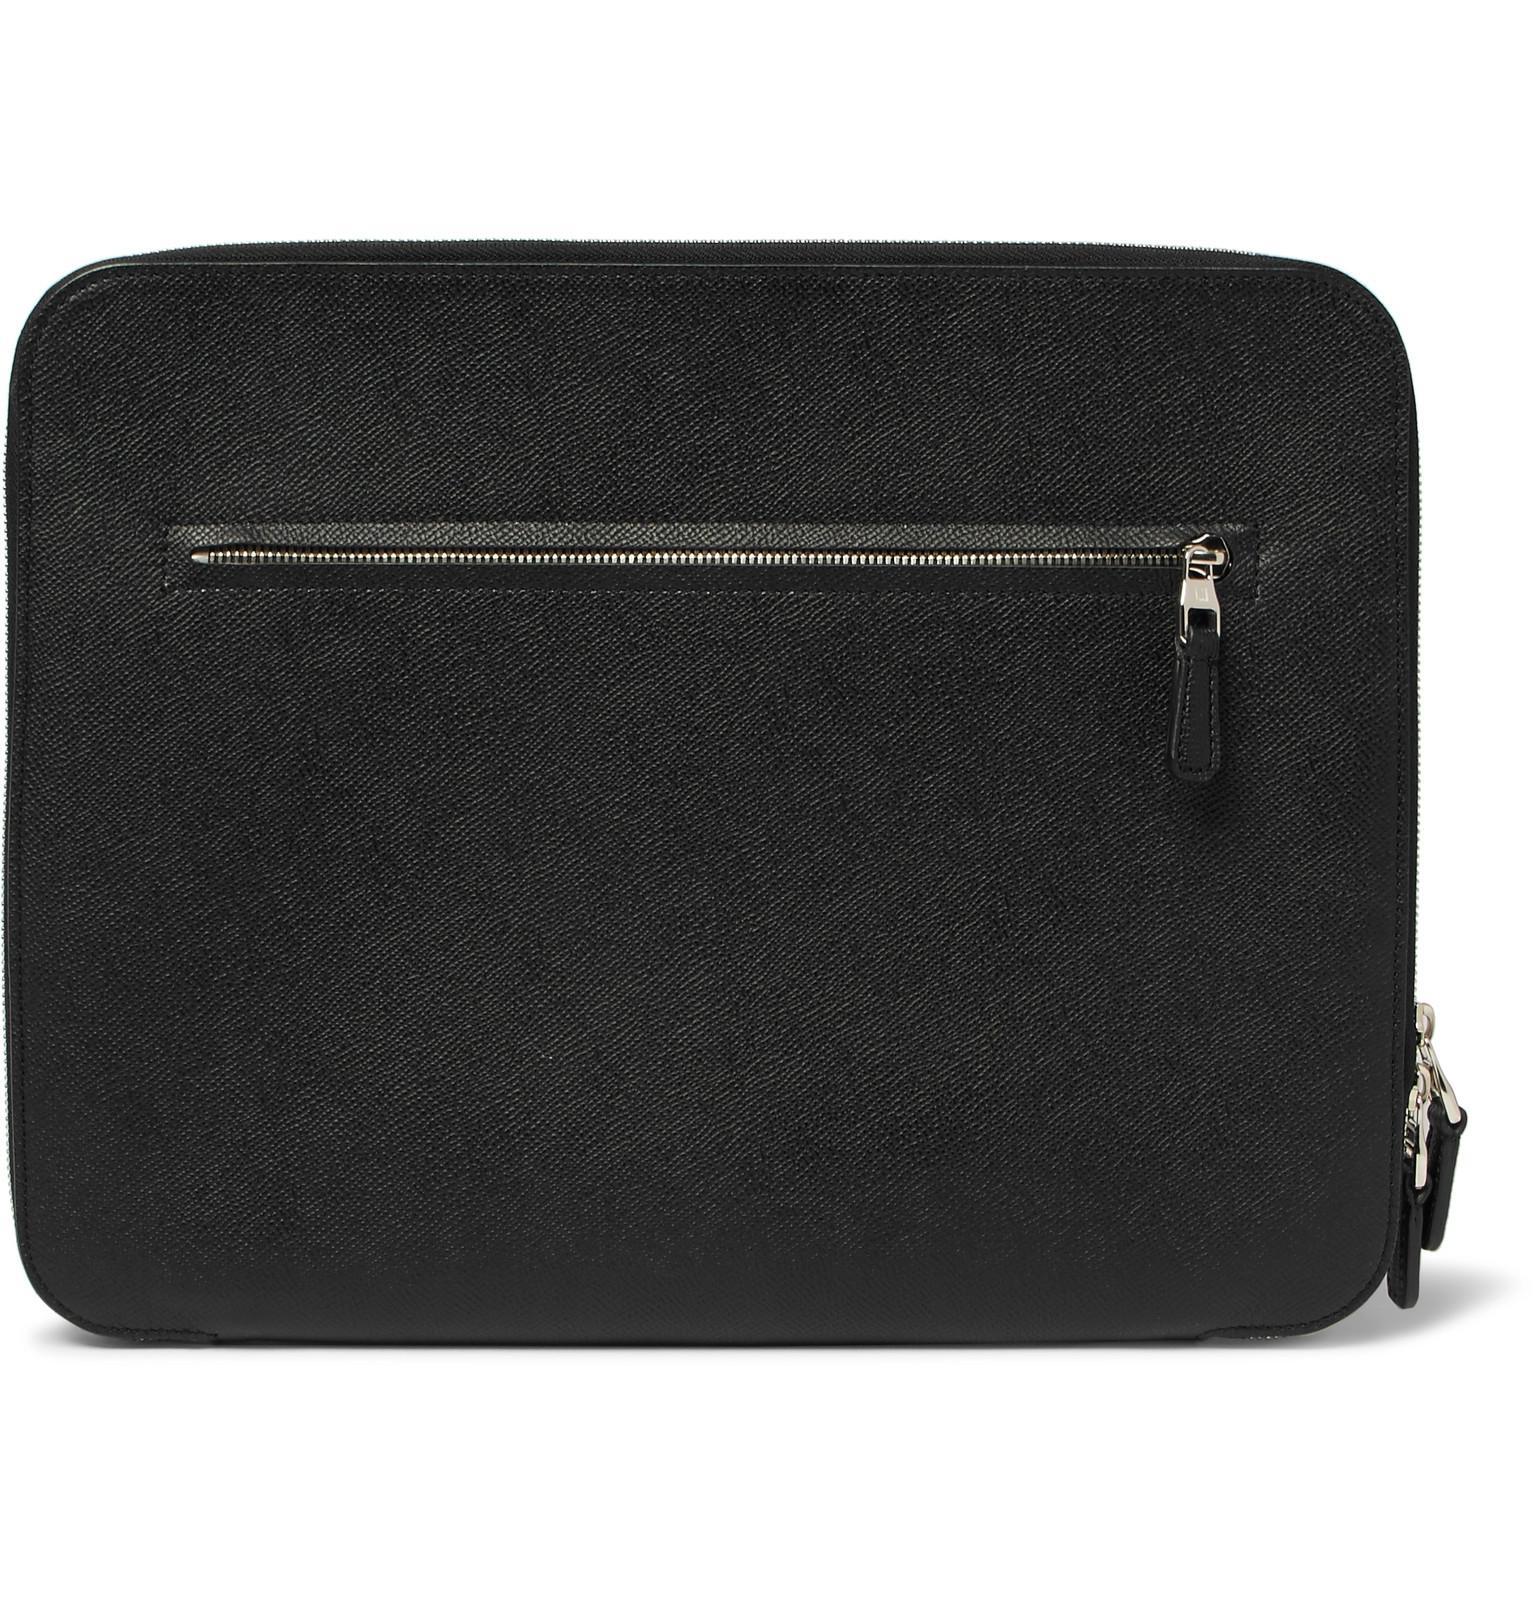 3c7dfce4 Men's Black Cadogan Full-grain Leather Zip-around Pouch